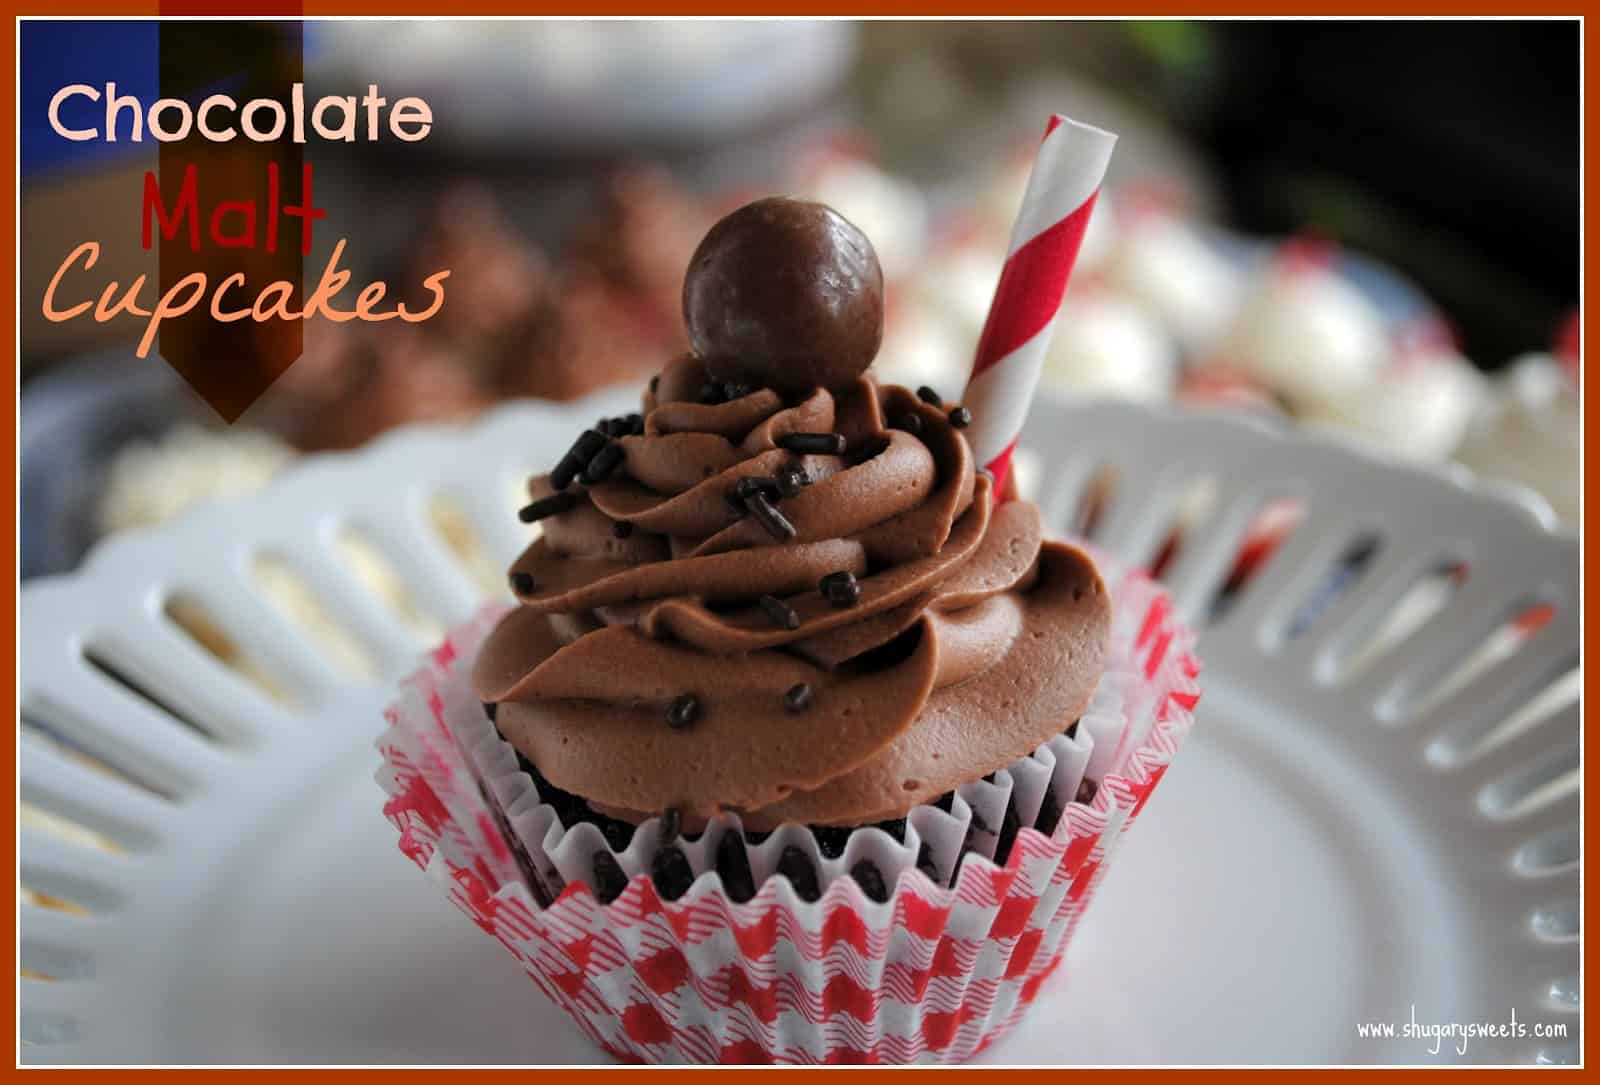 Chocolate Malt Cupcakes and my Anniversary - Shugary Sweets